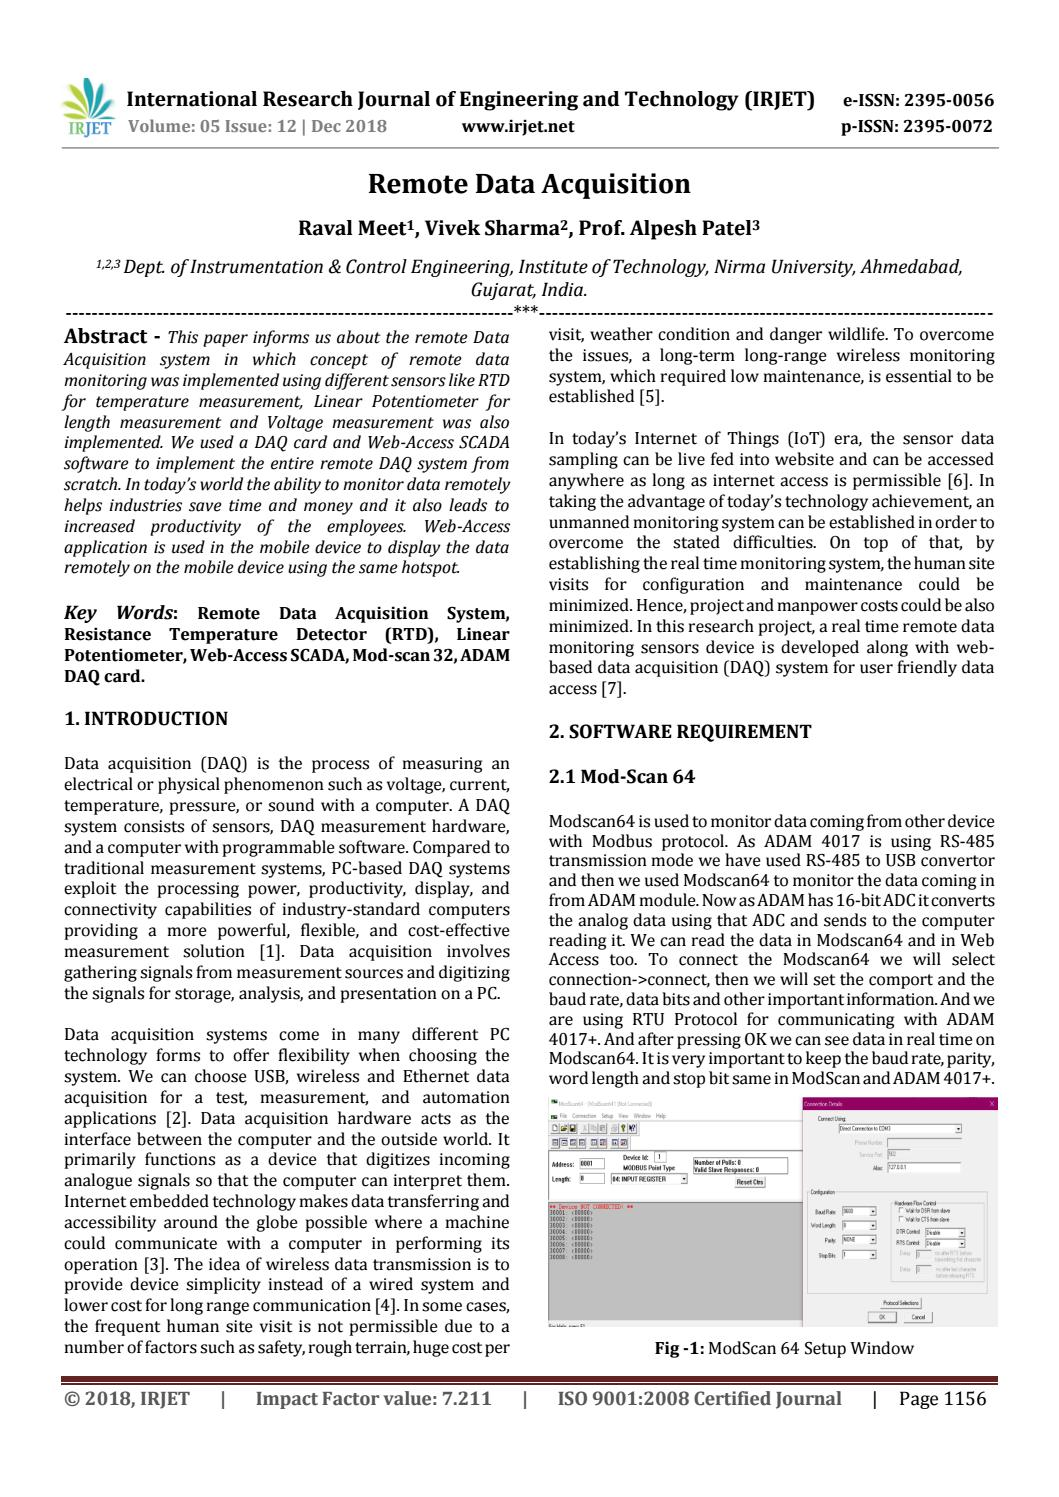 IRJET- Remote Data Acquisition by IRJET Journal - issuu